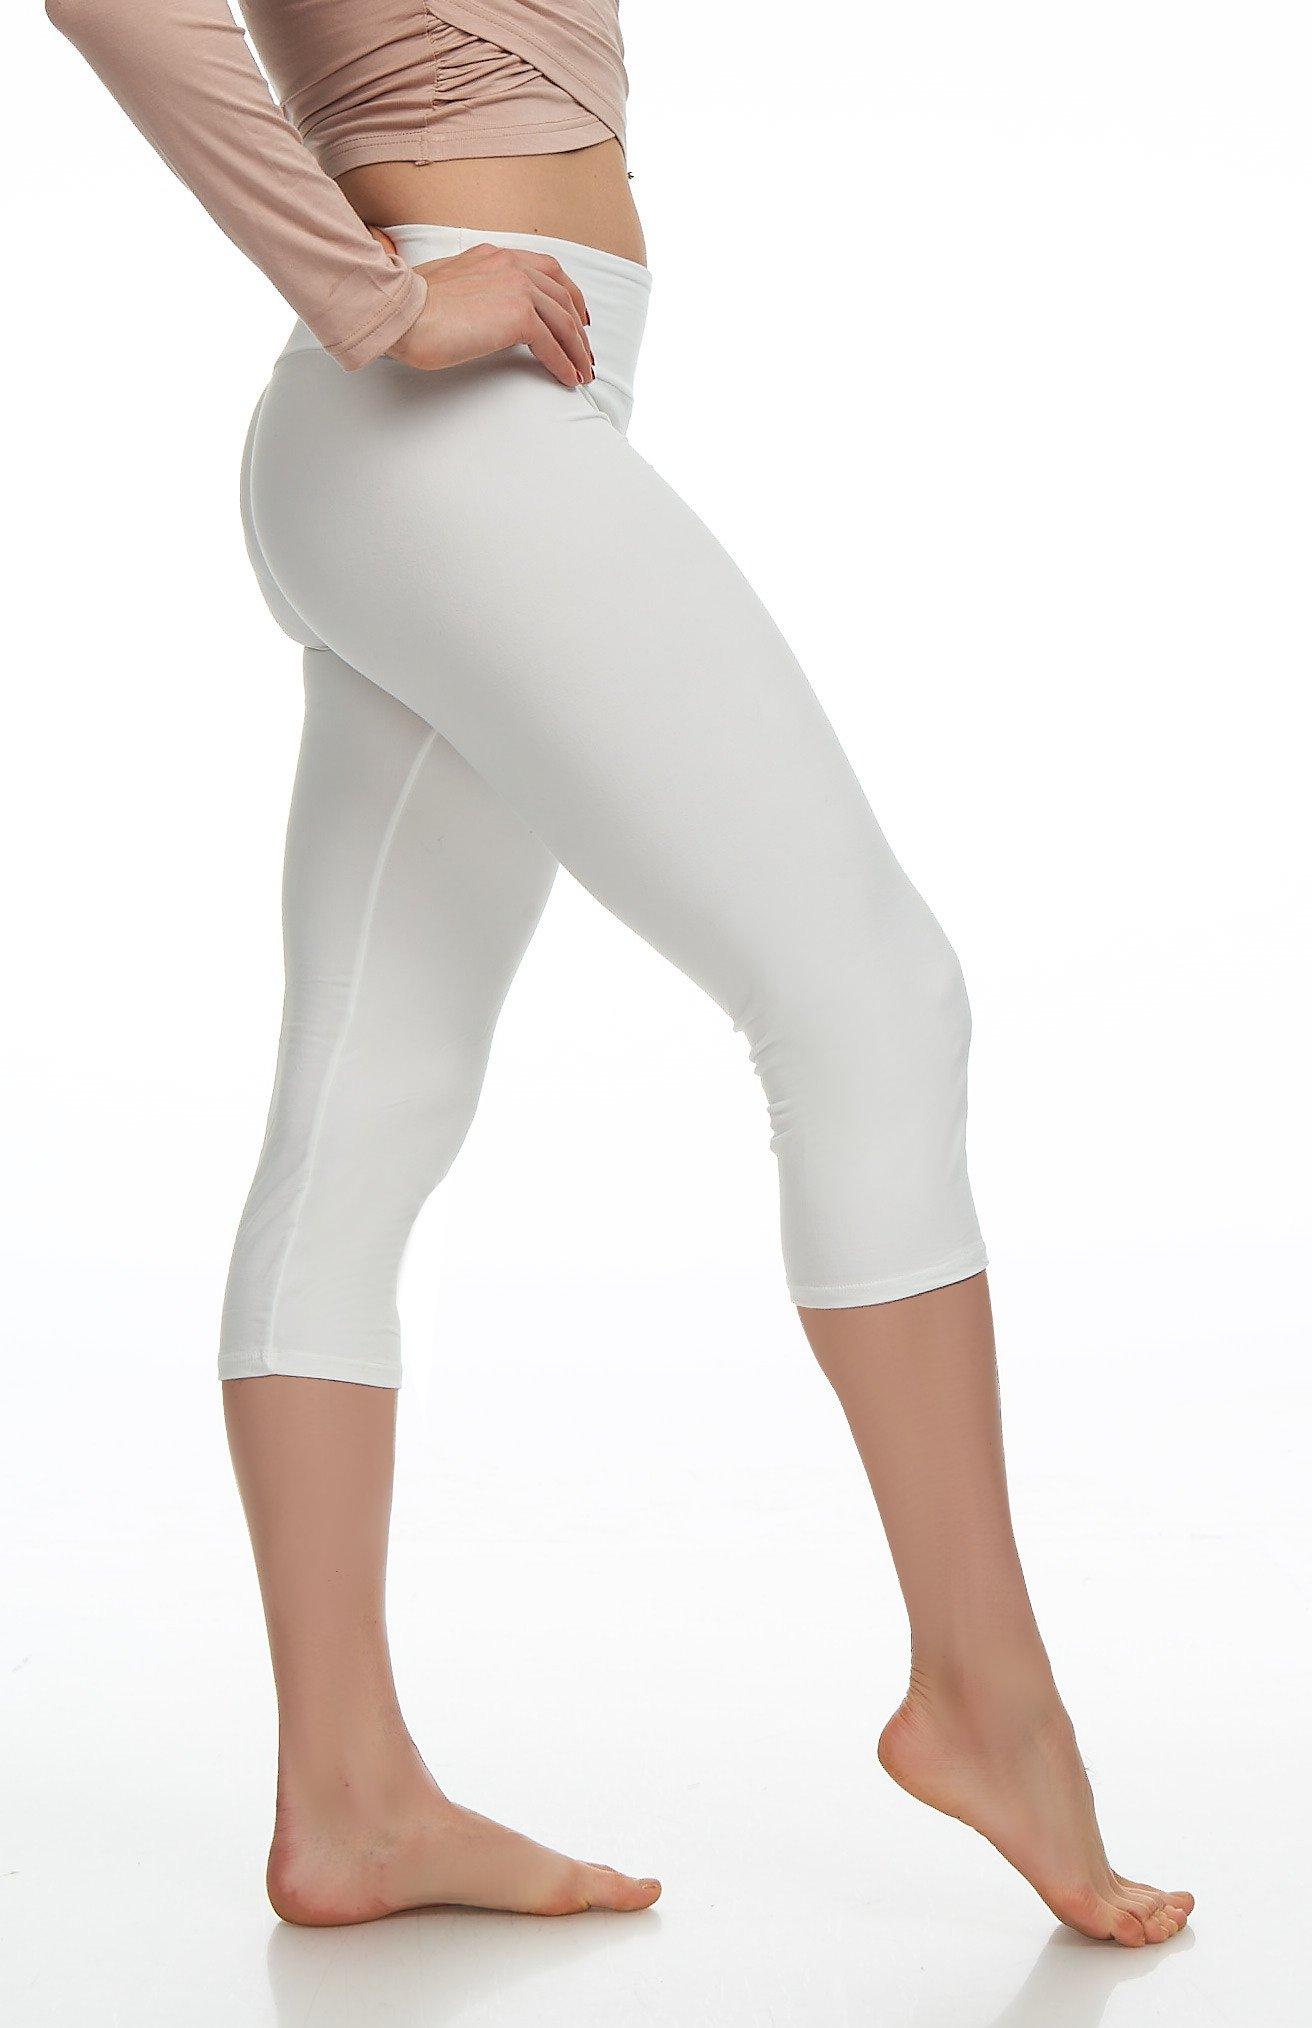 62e7da6ac85b8 LMB Womens Extra Soft Capri Leggings with High Yoga Waist 40+ Colors Plus  Size